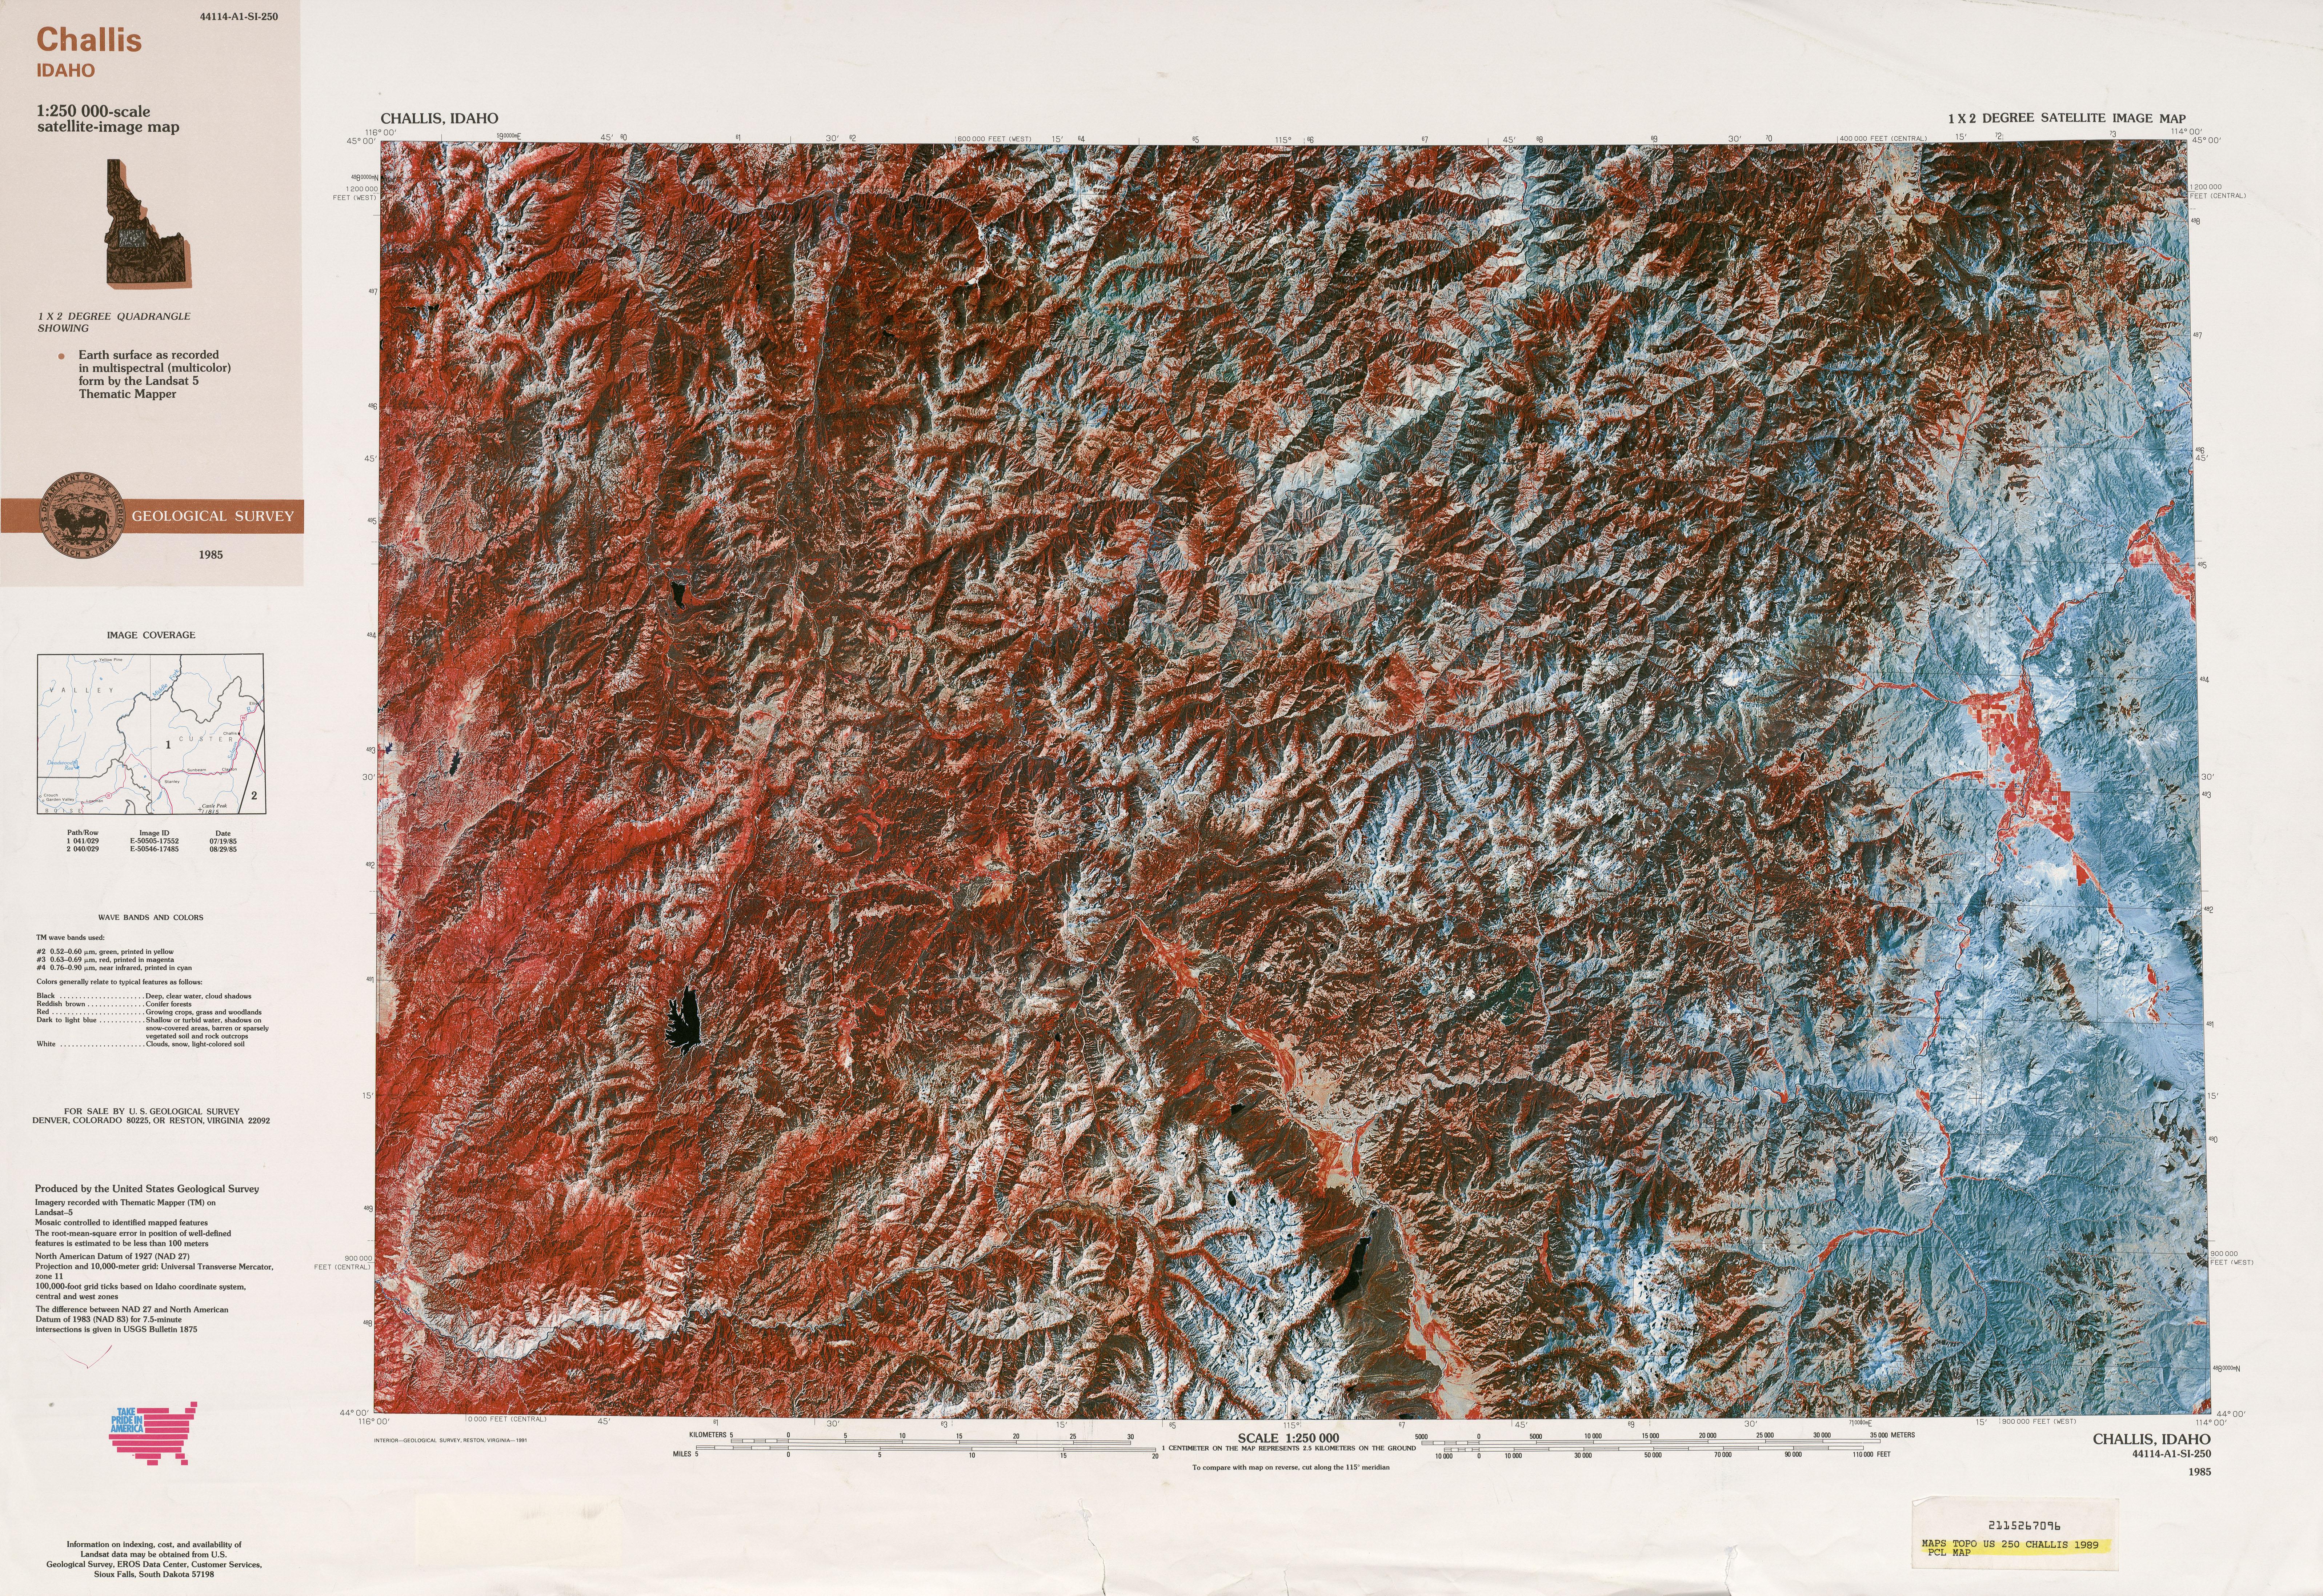 Hoja Challis Imagen Satelital, Estados Unidos 1989